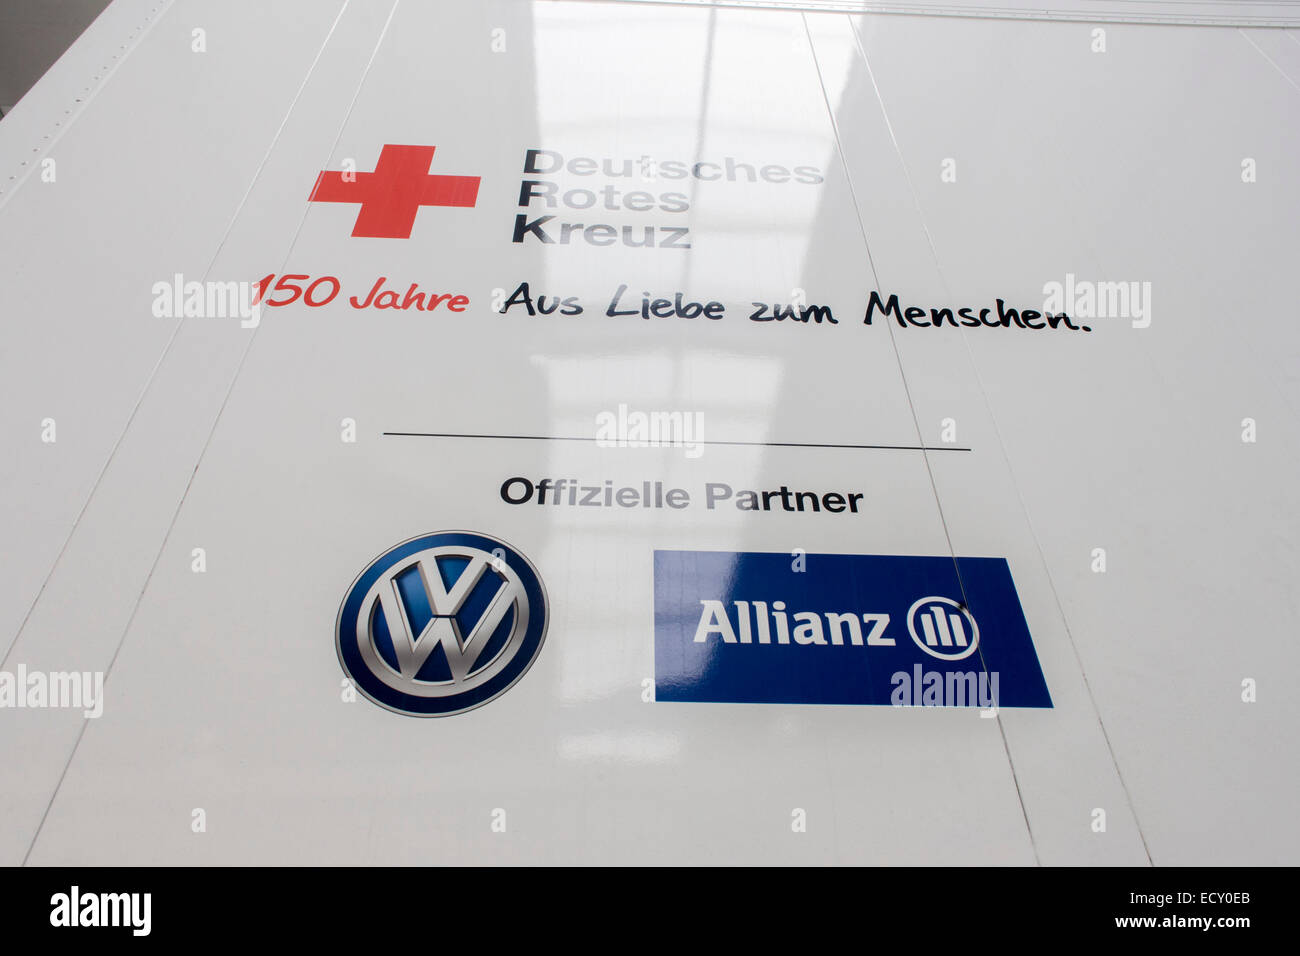 Deutsches Rotes Kreuz - DRK (German Red Cross) vehicle logos at their logistics centre at Berlin-Schönefeld - Stock Image